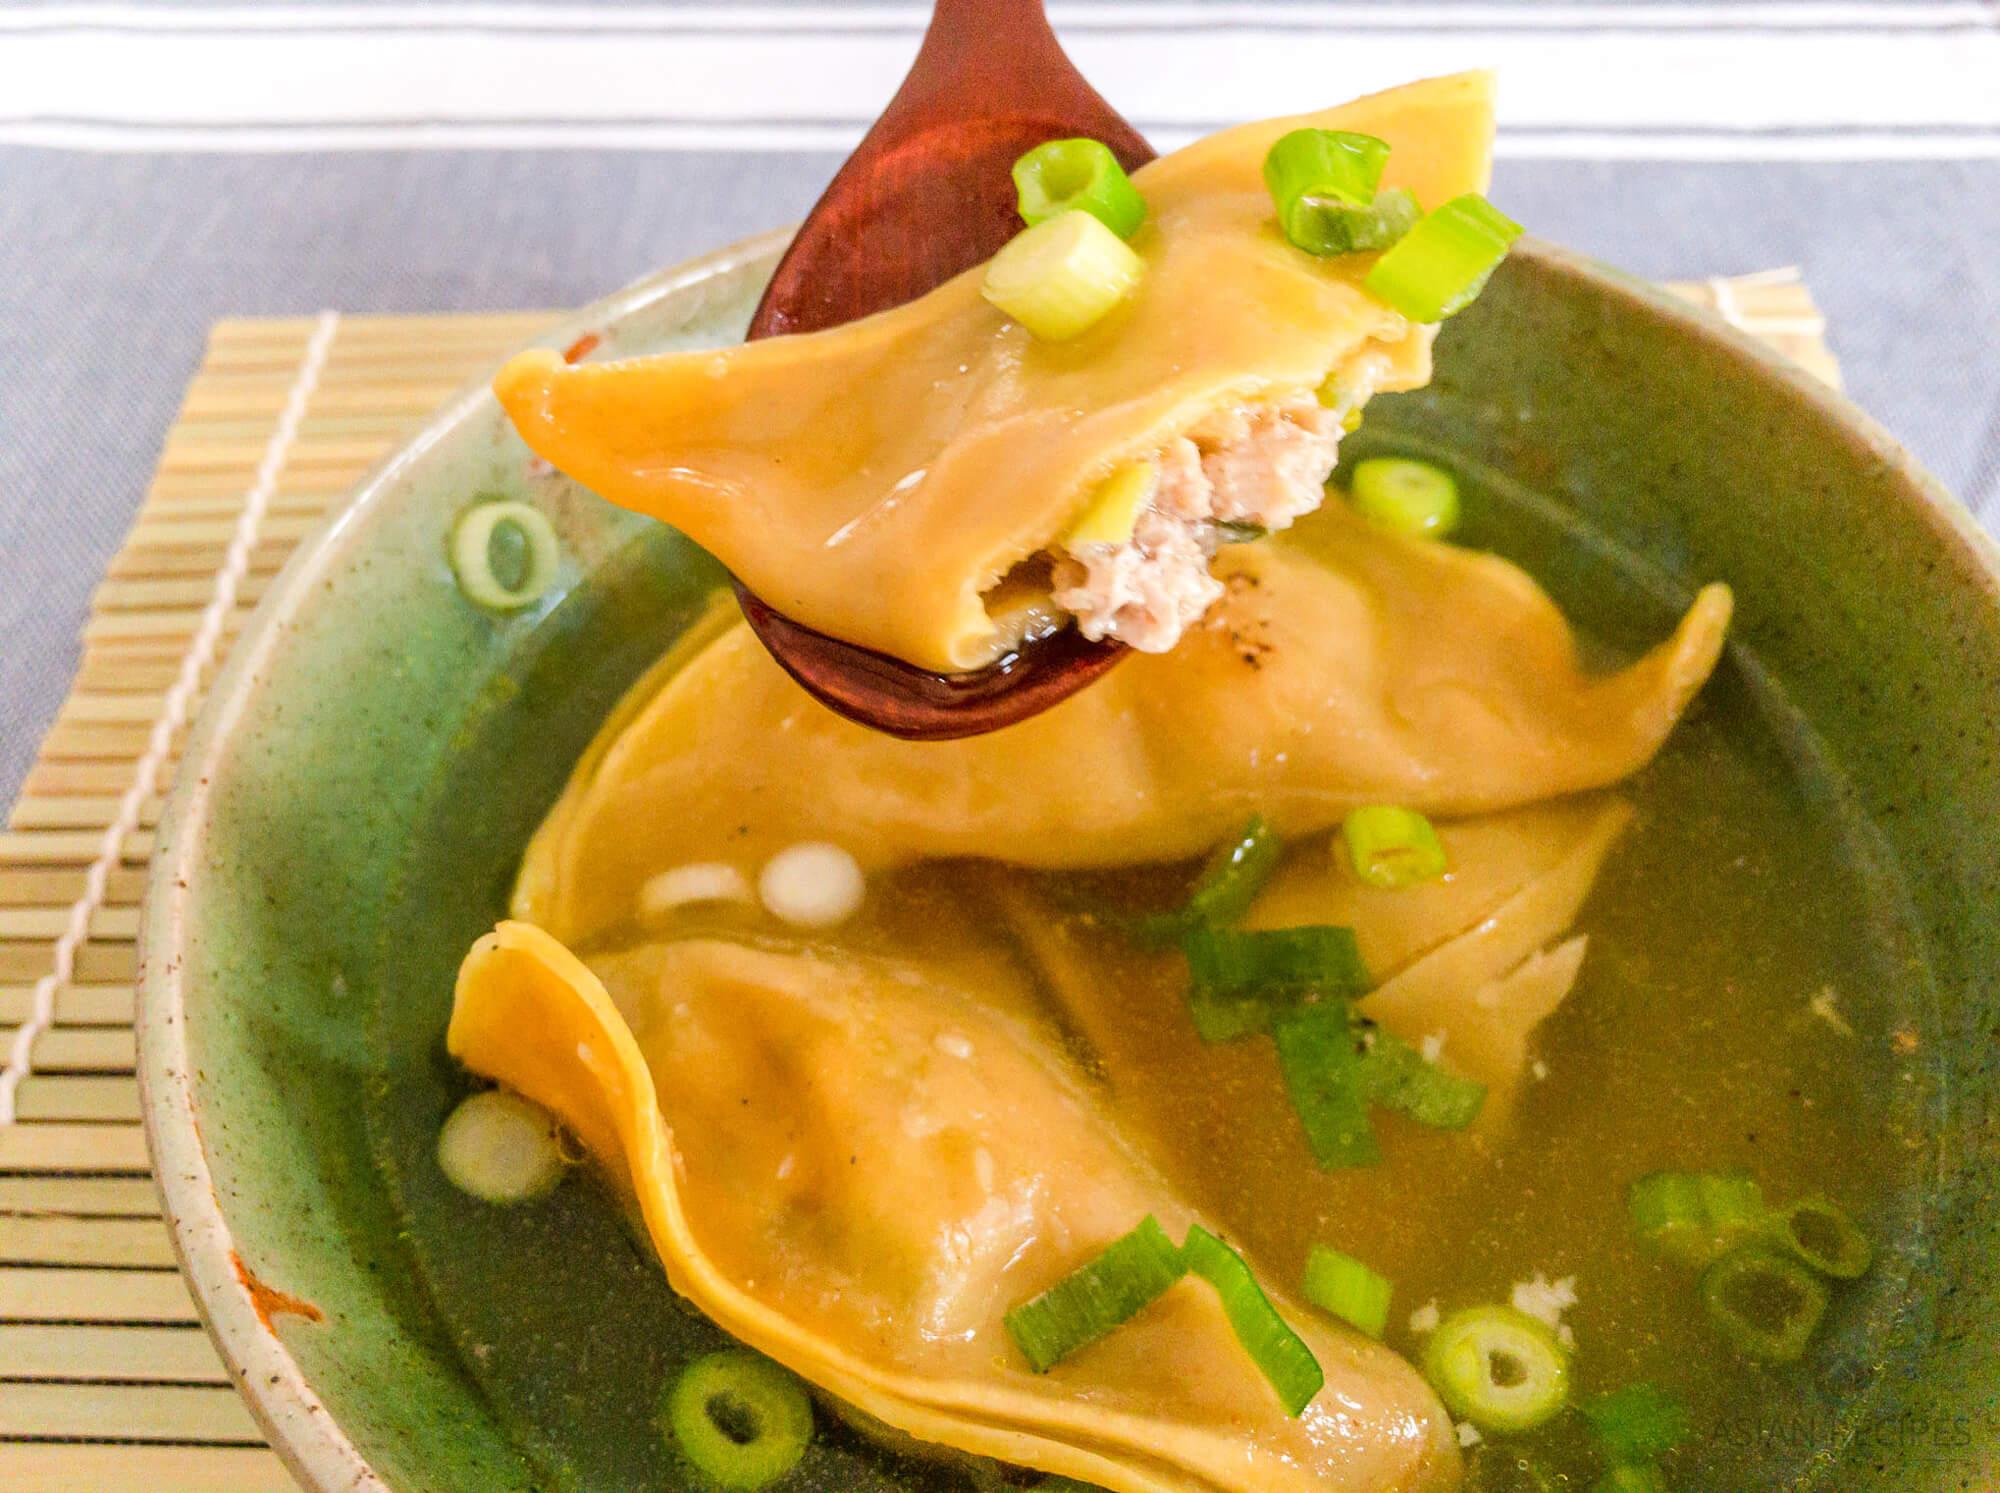 A spoon full of a Korean dumpling (mandu) in a clear broth based soup.